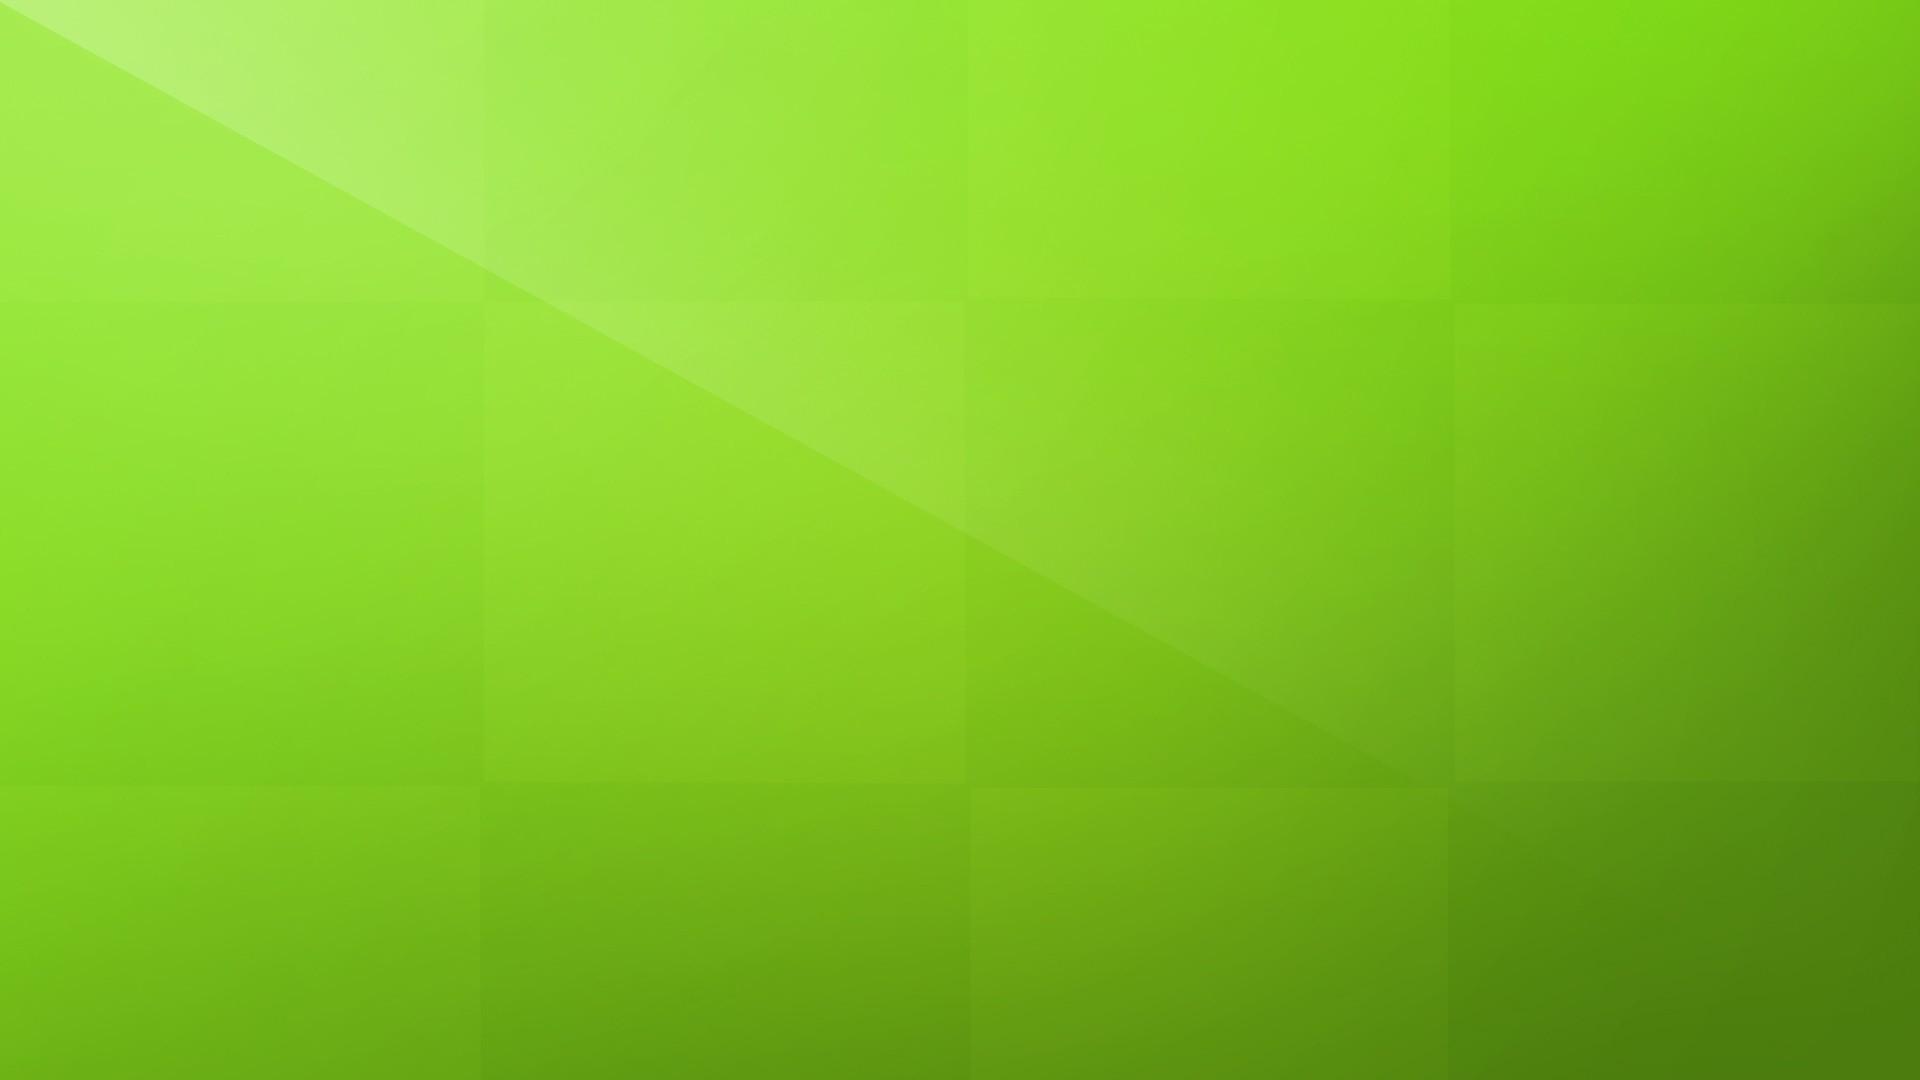 solid color wallpapers desktop  70  images